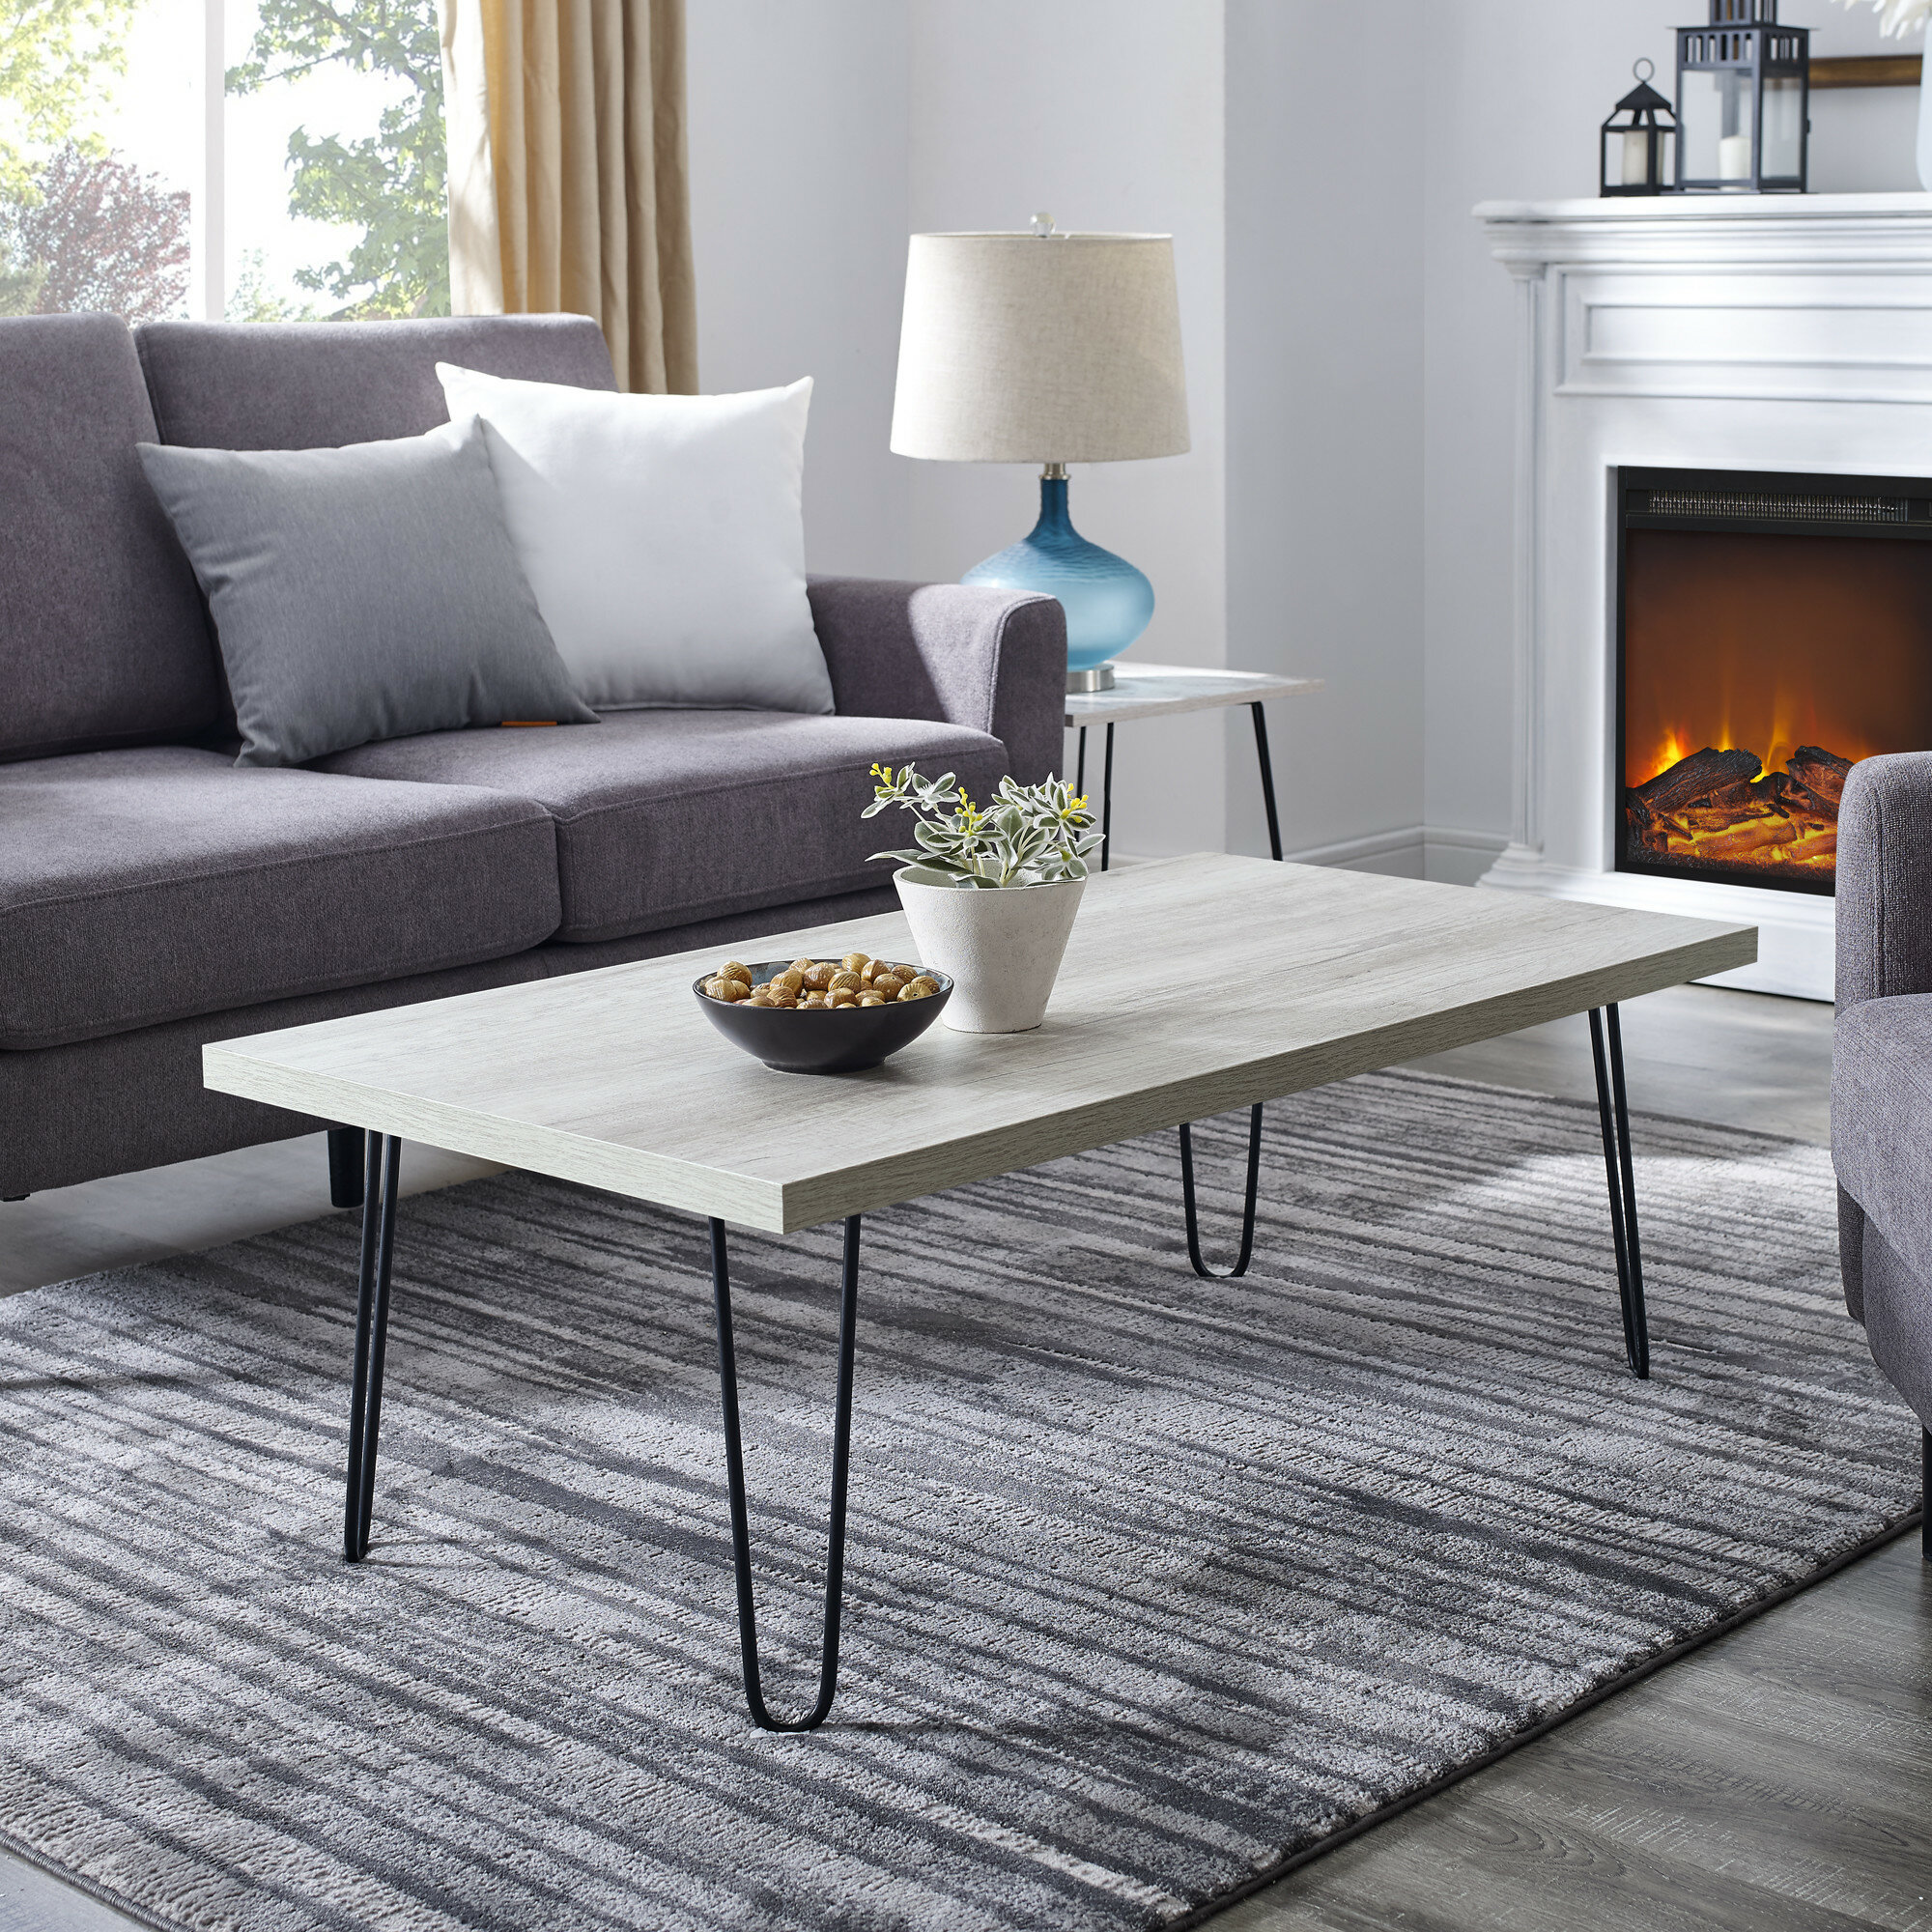 Magnificent Jonali Coffee Table Ibusinesslaw Wood Chair Design Ideas Ibusinesslaworg